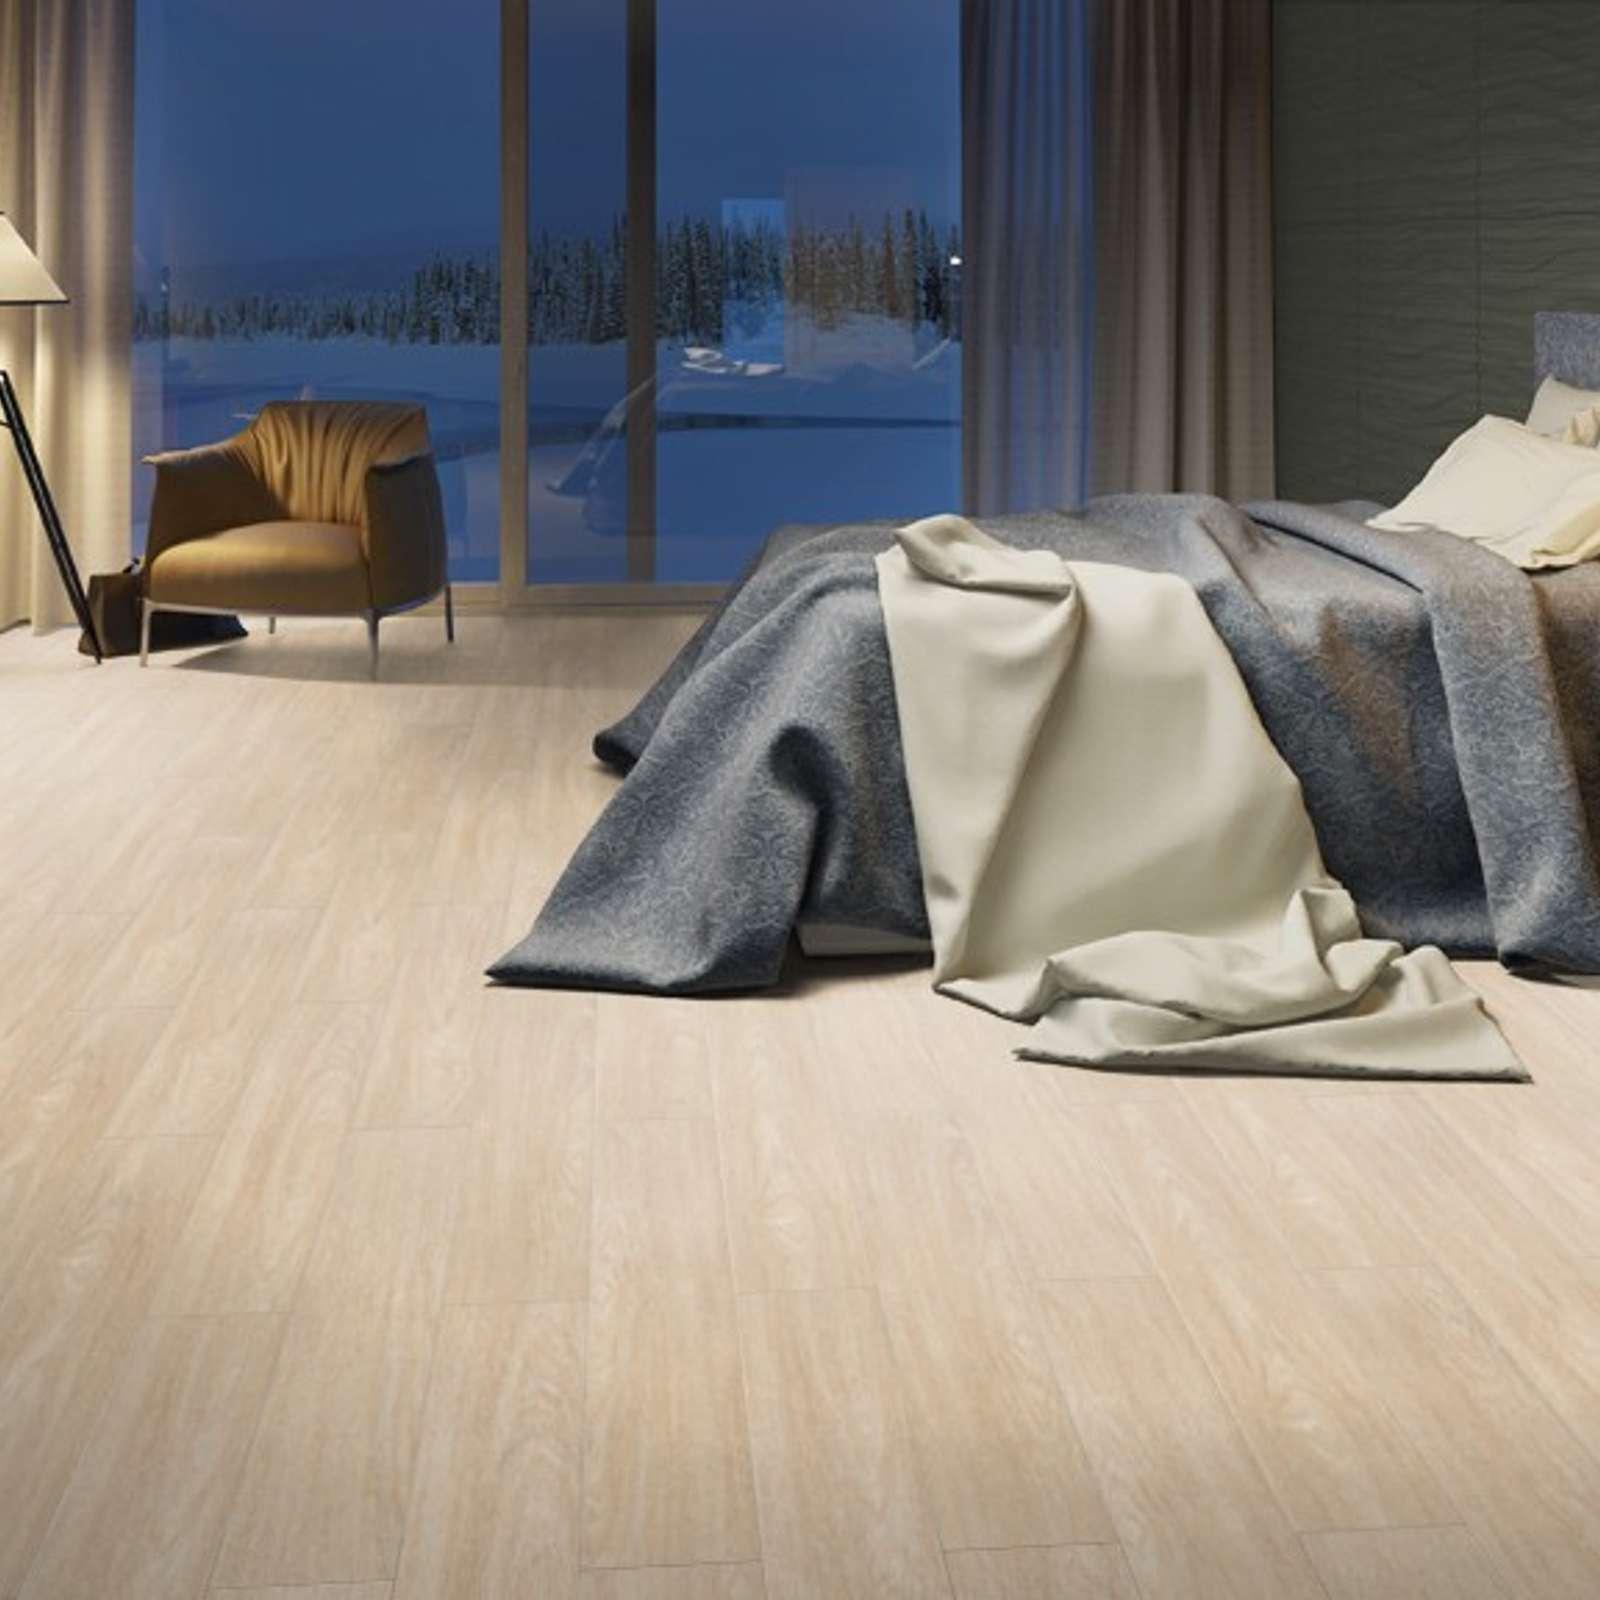 Плитка ПВХ Tarkett Art Vinil Lounge Simple 101,6х914,4x3мм(2,04м2/22шт/уп) 257010011